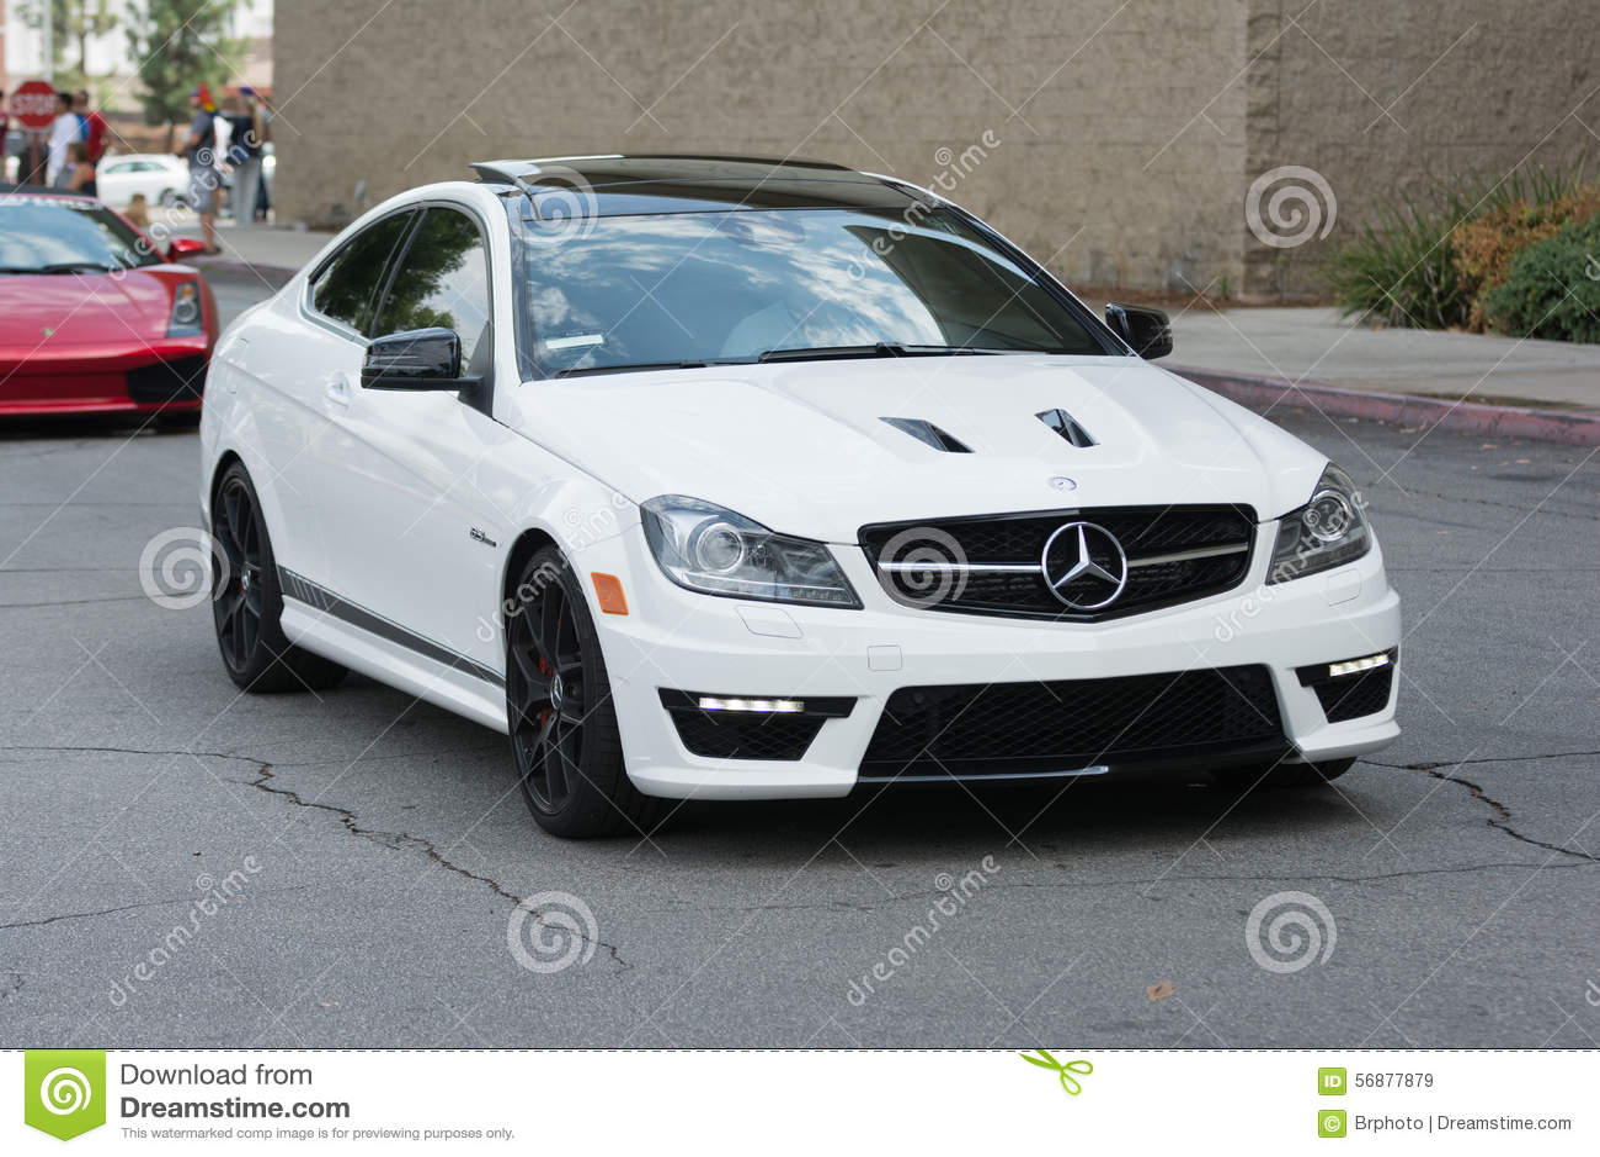 Mercedes Benz c63 AMG car on display